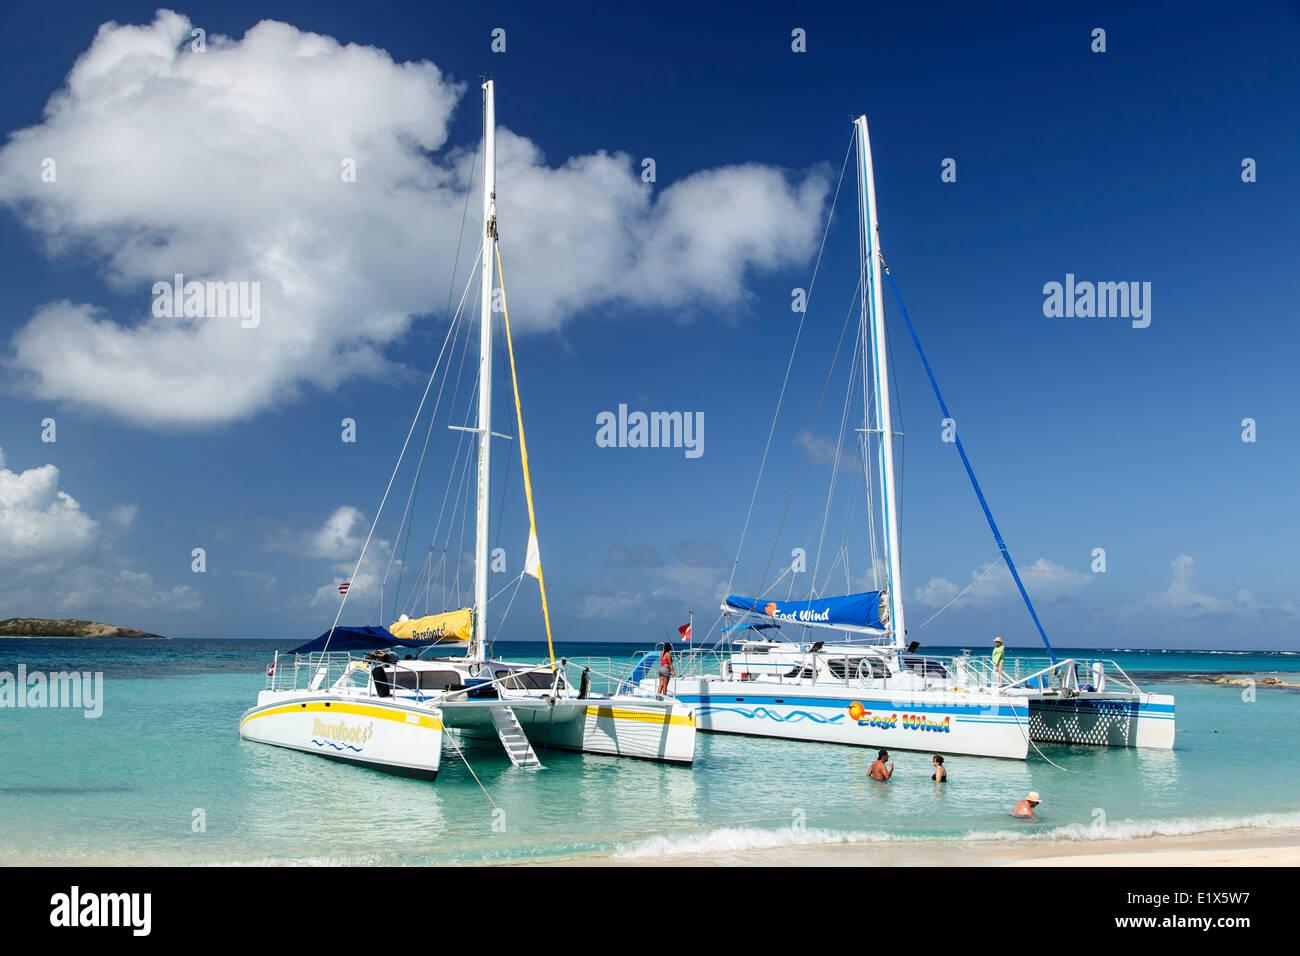 Catamarans anchored at Icacos Island, near Fajardo, Puerto Rico - Stock Image